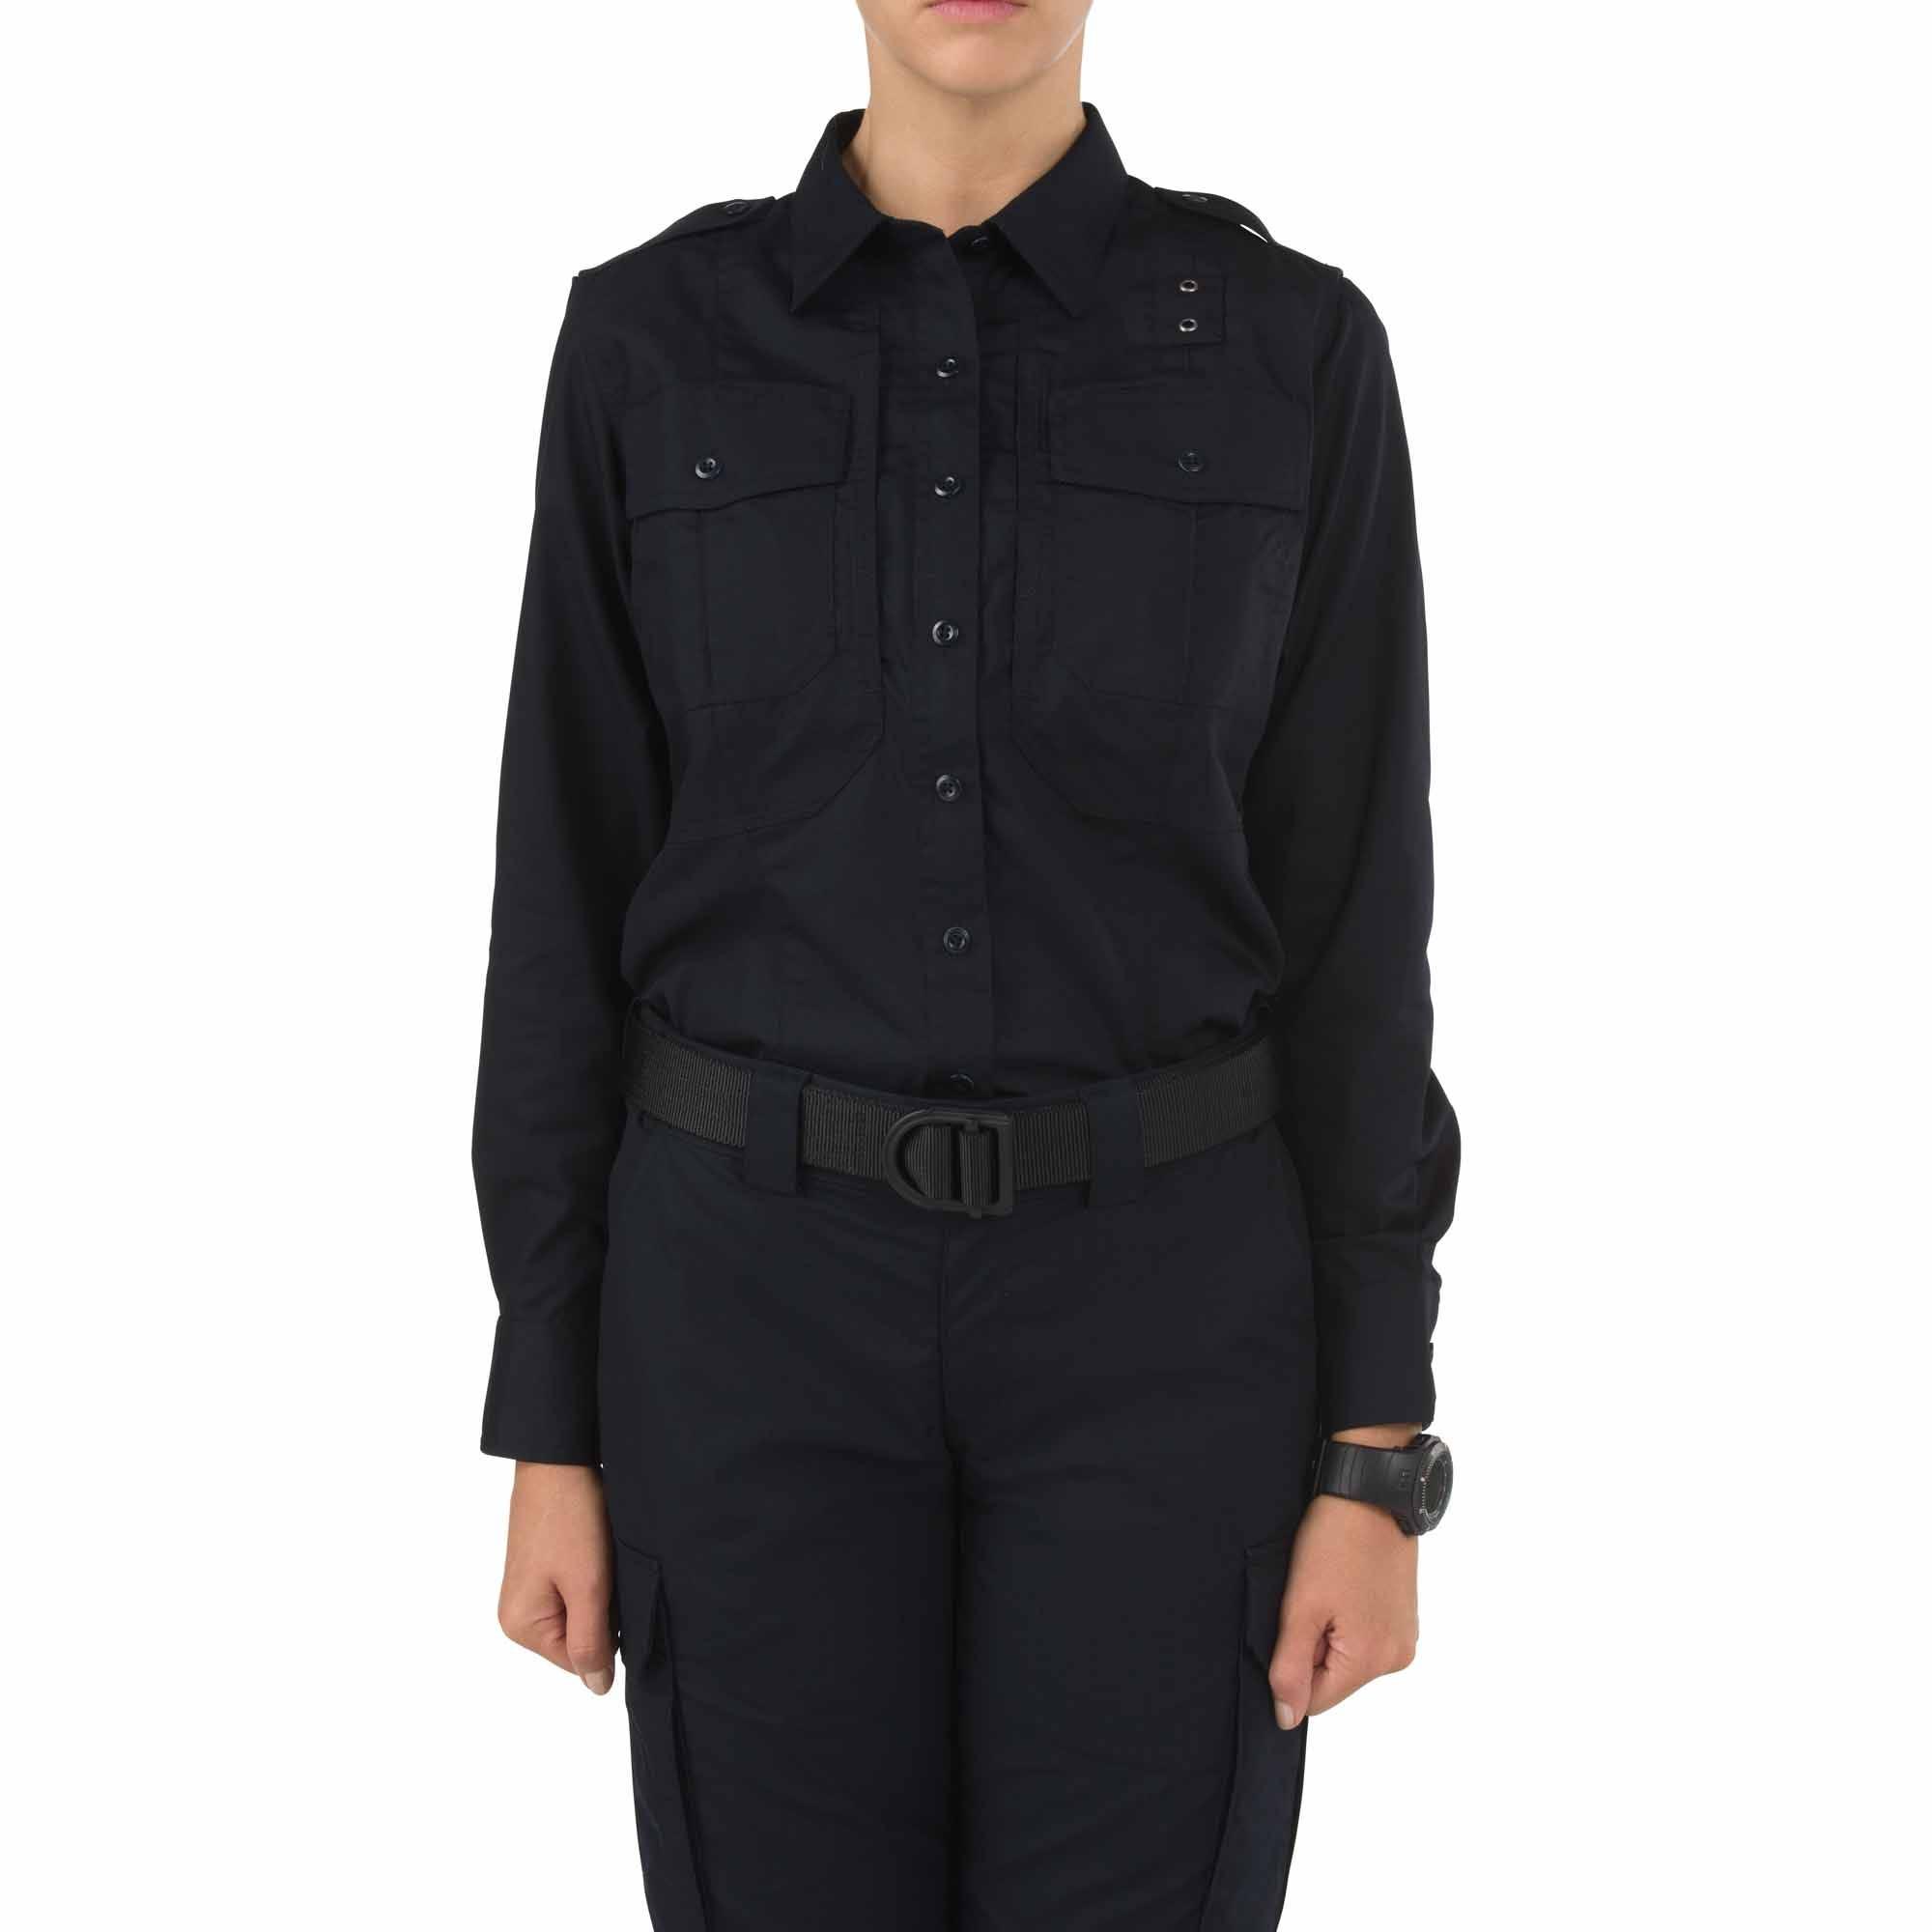 5.11 Tactical Women Women's TACLITE PDU Class-B Long Sleeve Shirt (Blue)